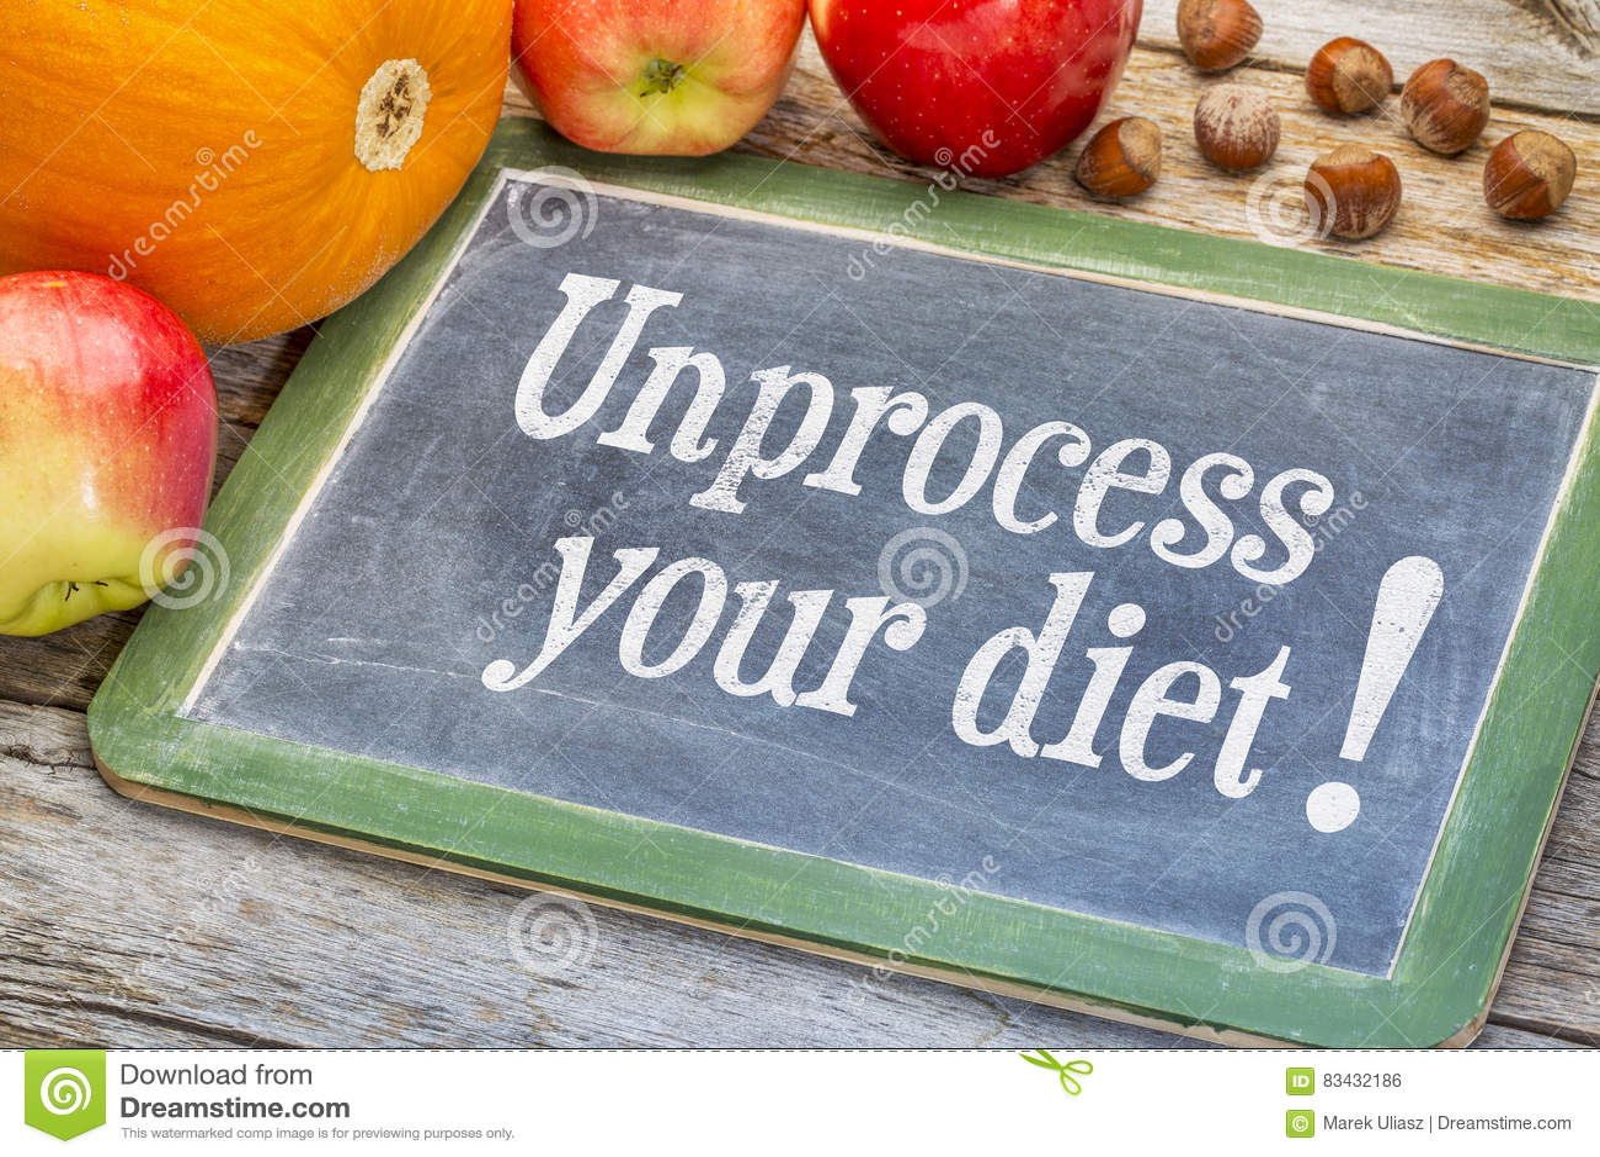 Unprocess η διατροφή σας - υγιής έννοια κατανάλωσης